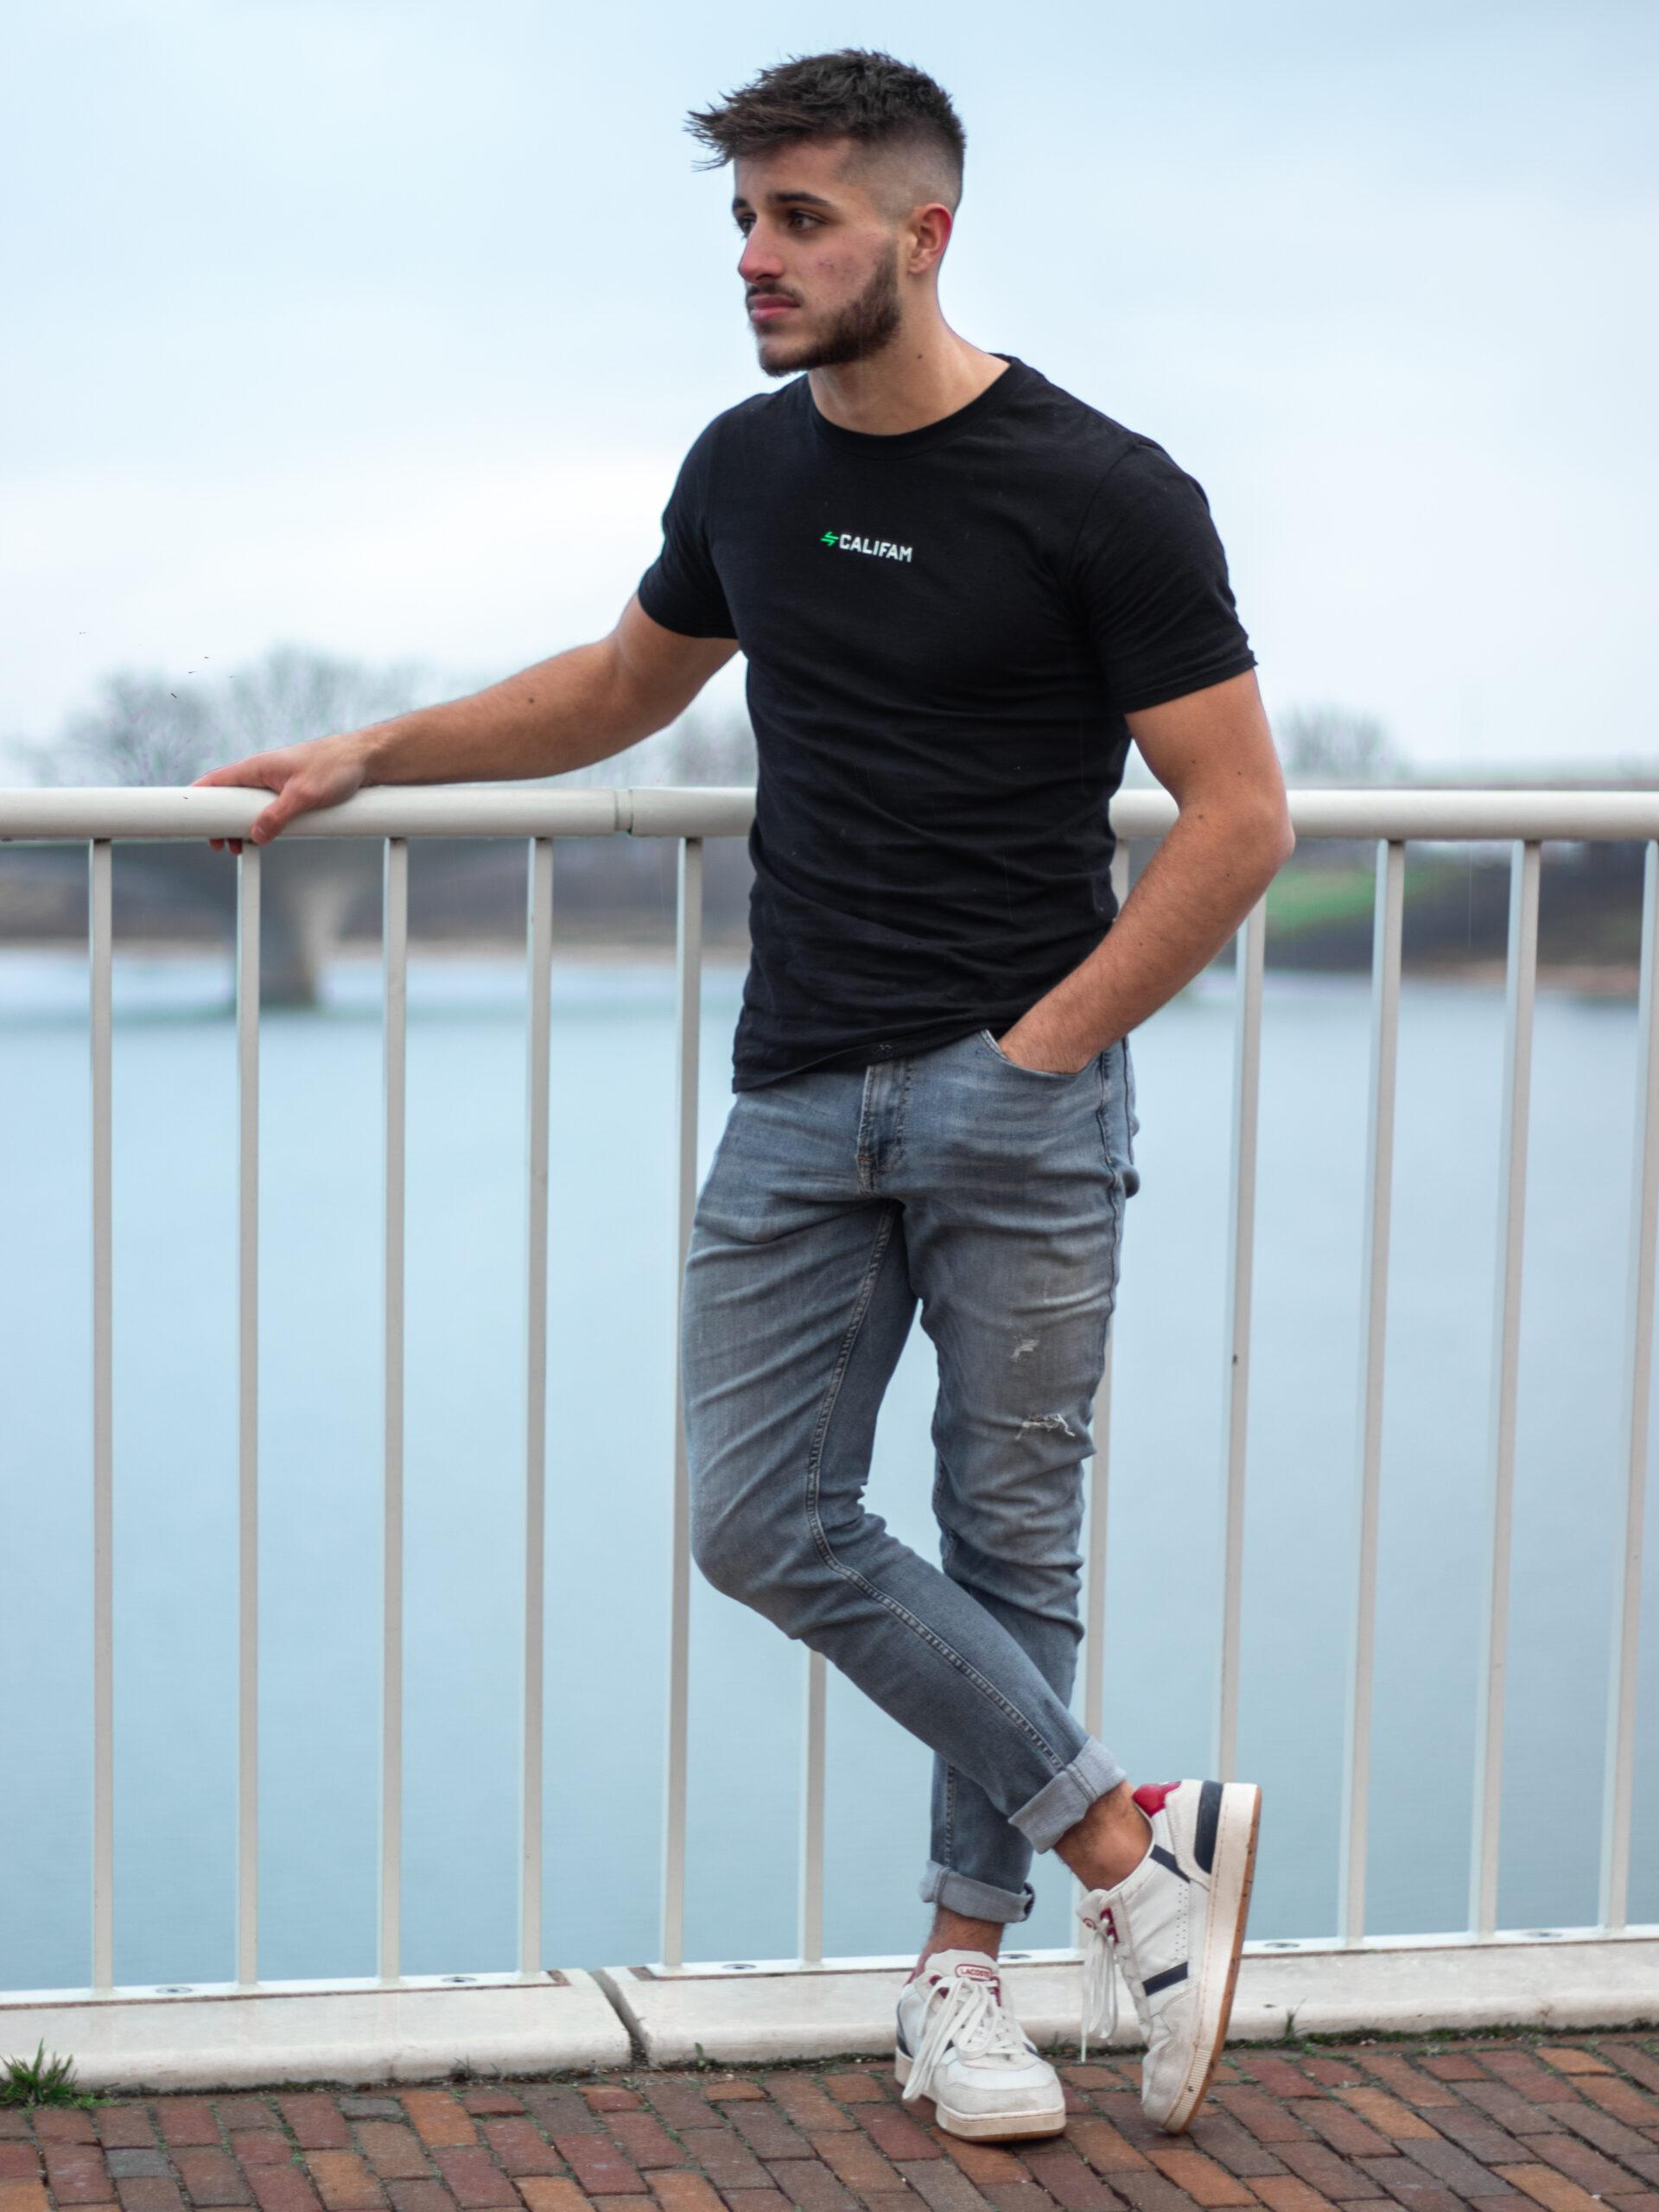 Calisthenics Clothes CaliFam T-shirt Black